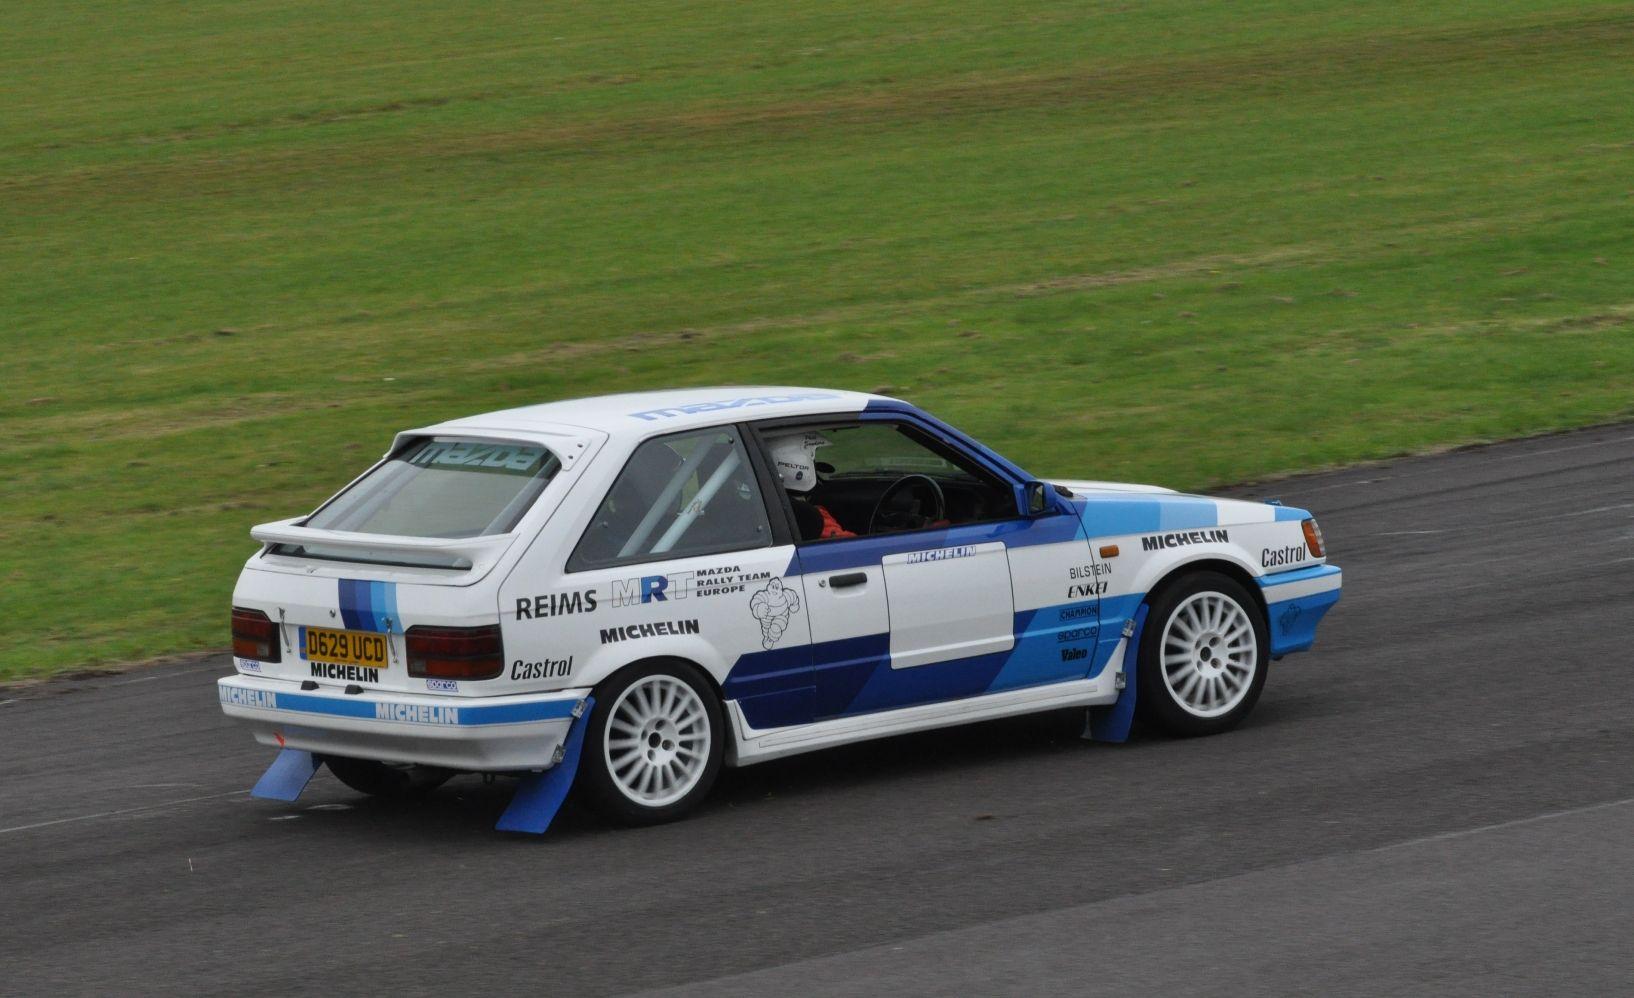 Mazda 323 Rally Car | Classic Cars | Pinterest | Rally car, Mazda ...